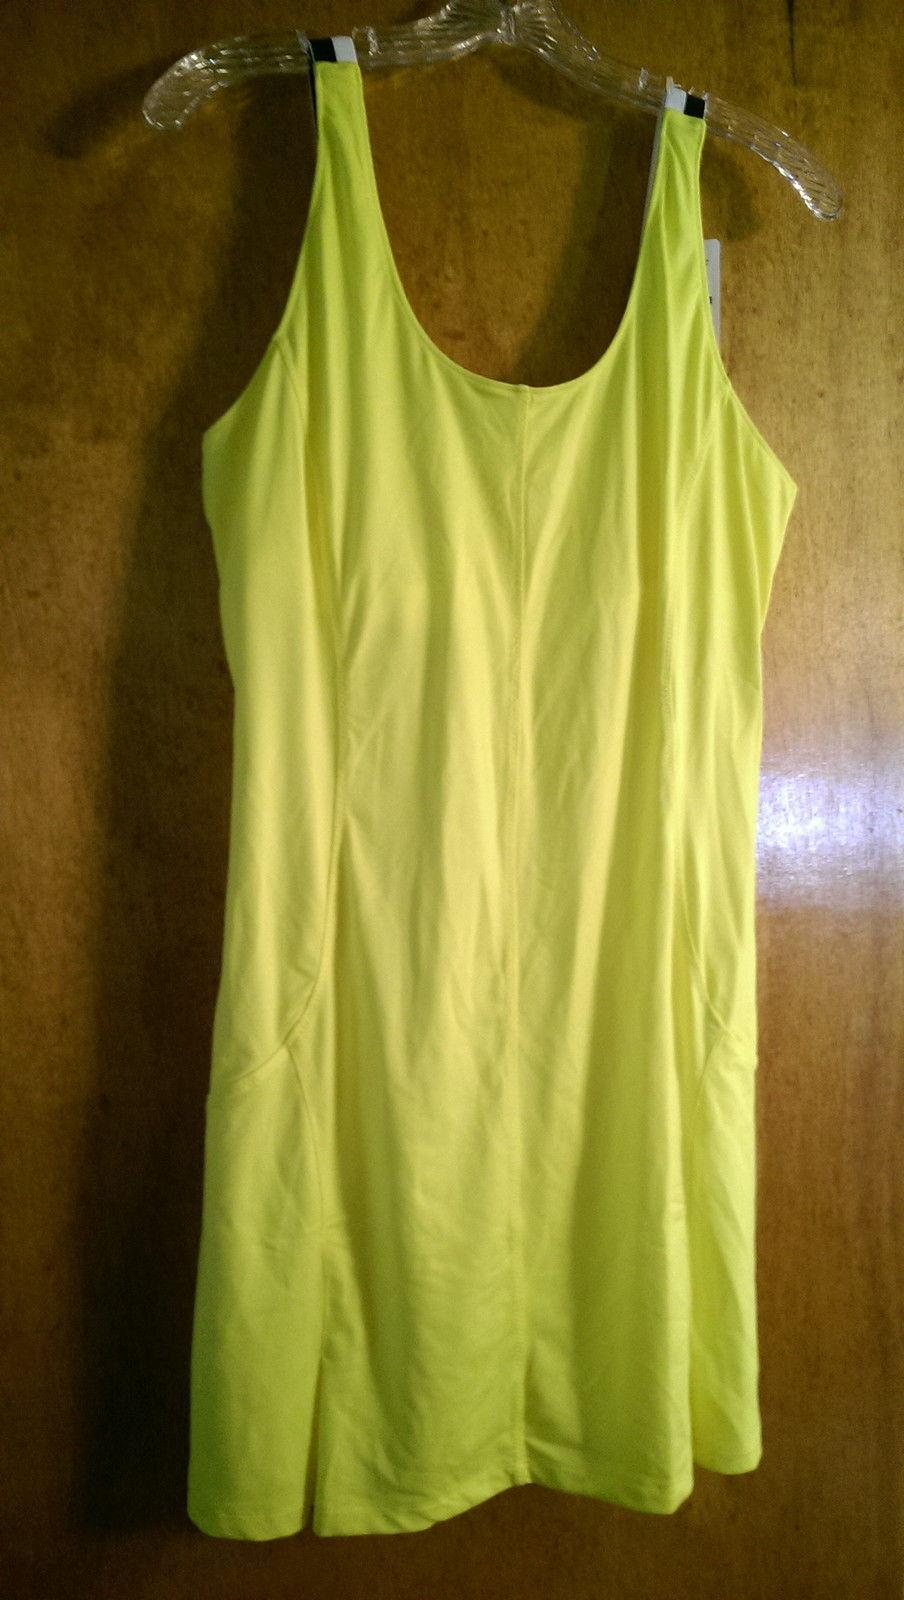 a34122b513e NWT Ladies Womens FILA Bright Yellow TENNIS DRESS - size XL 12 14 16